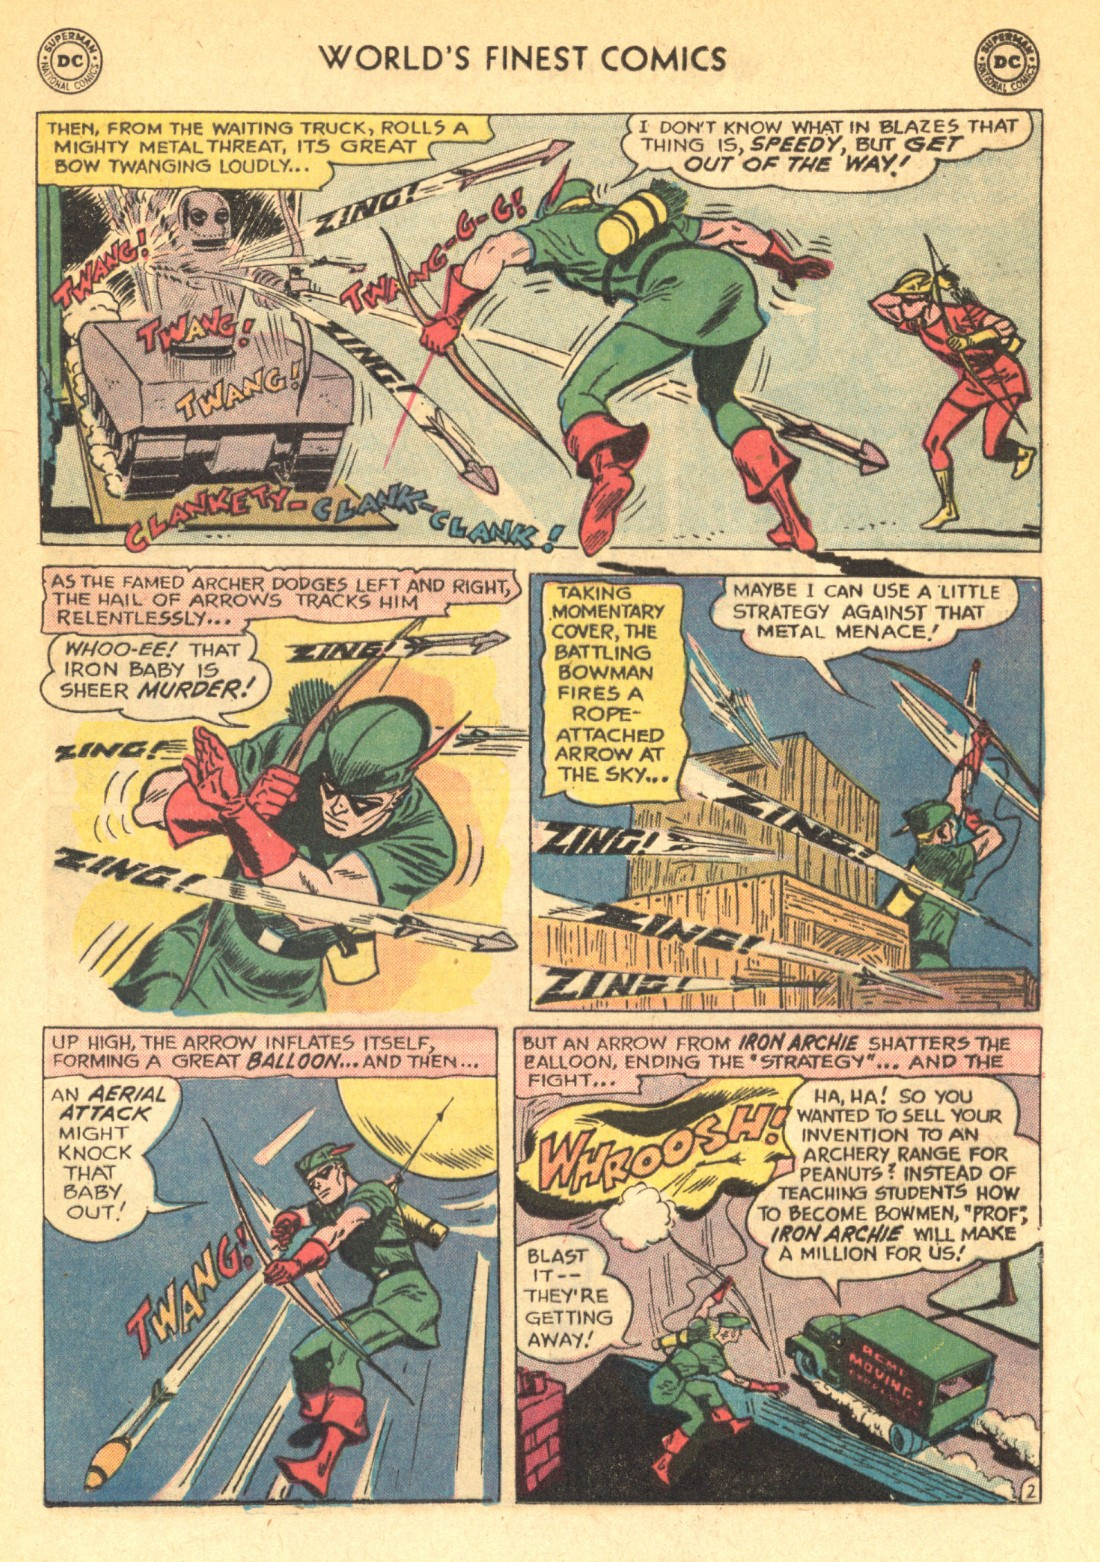 Read online World's Finest Comics comic -  Issue #129 - 28